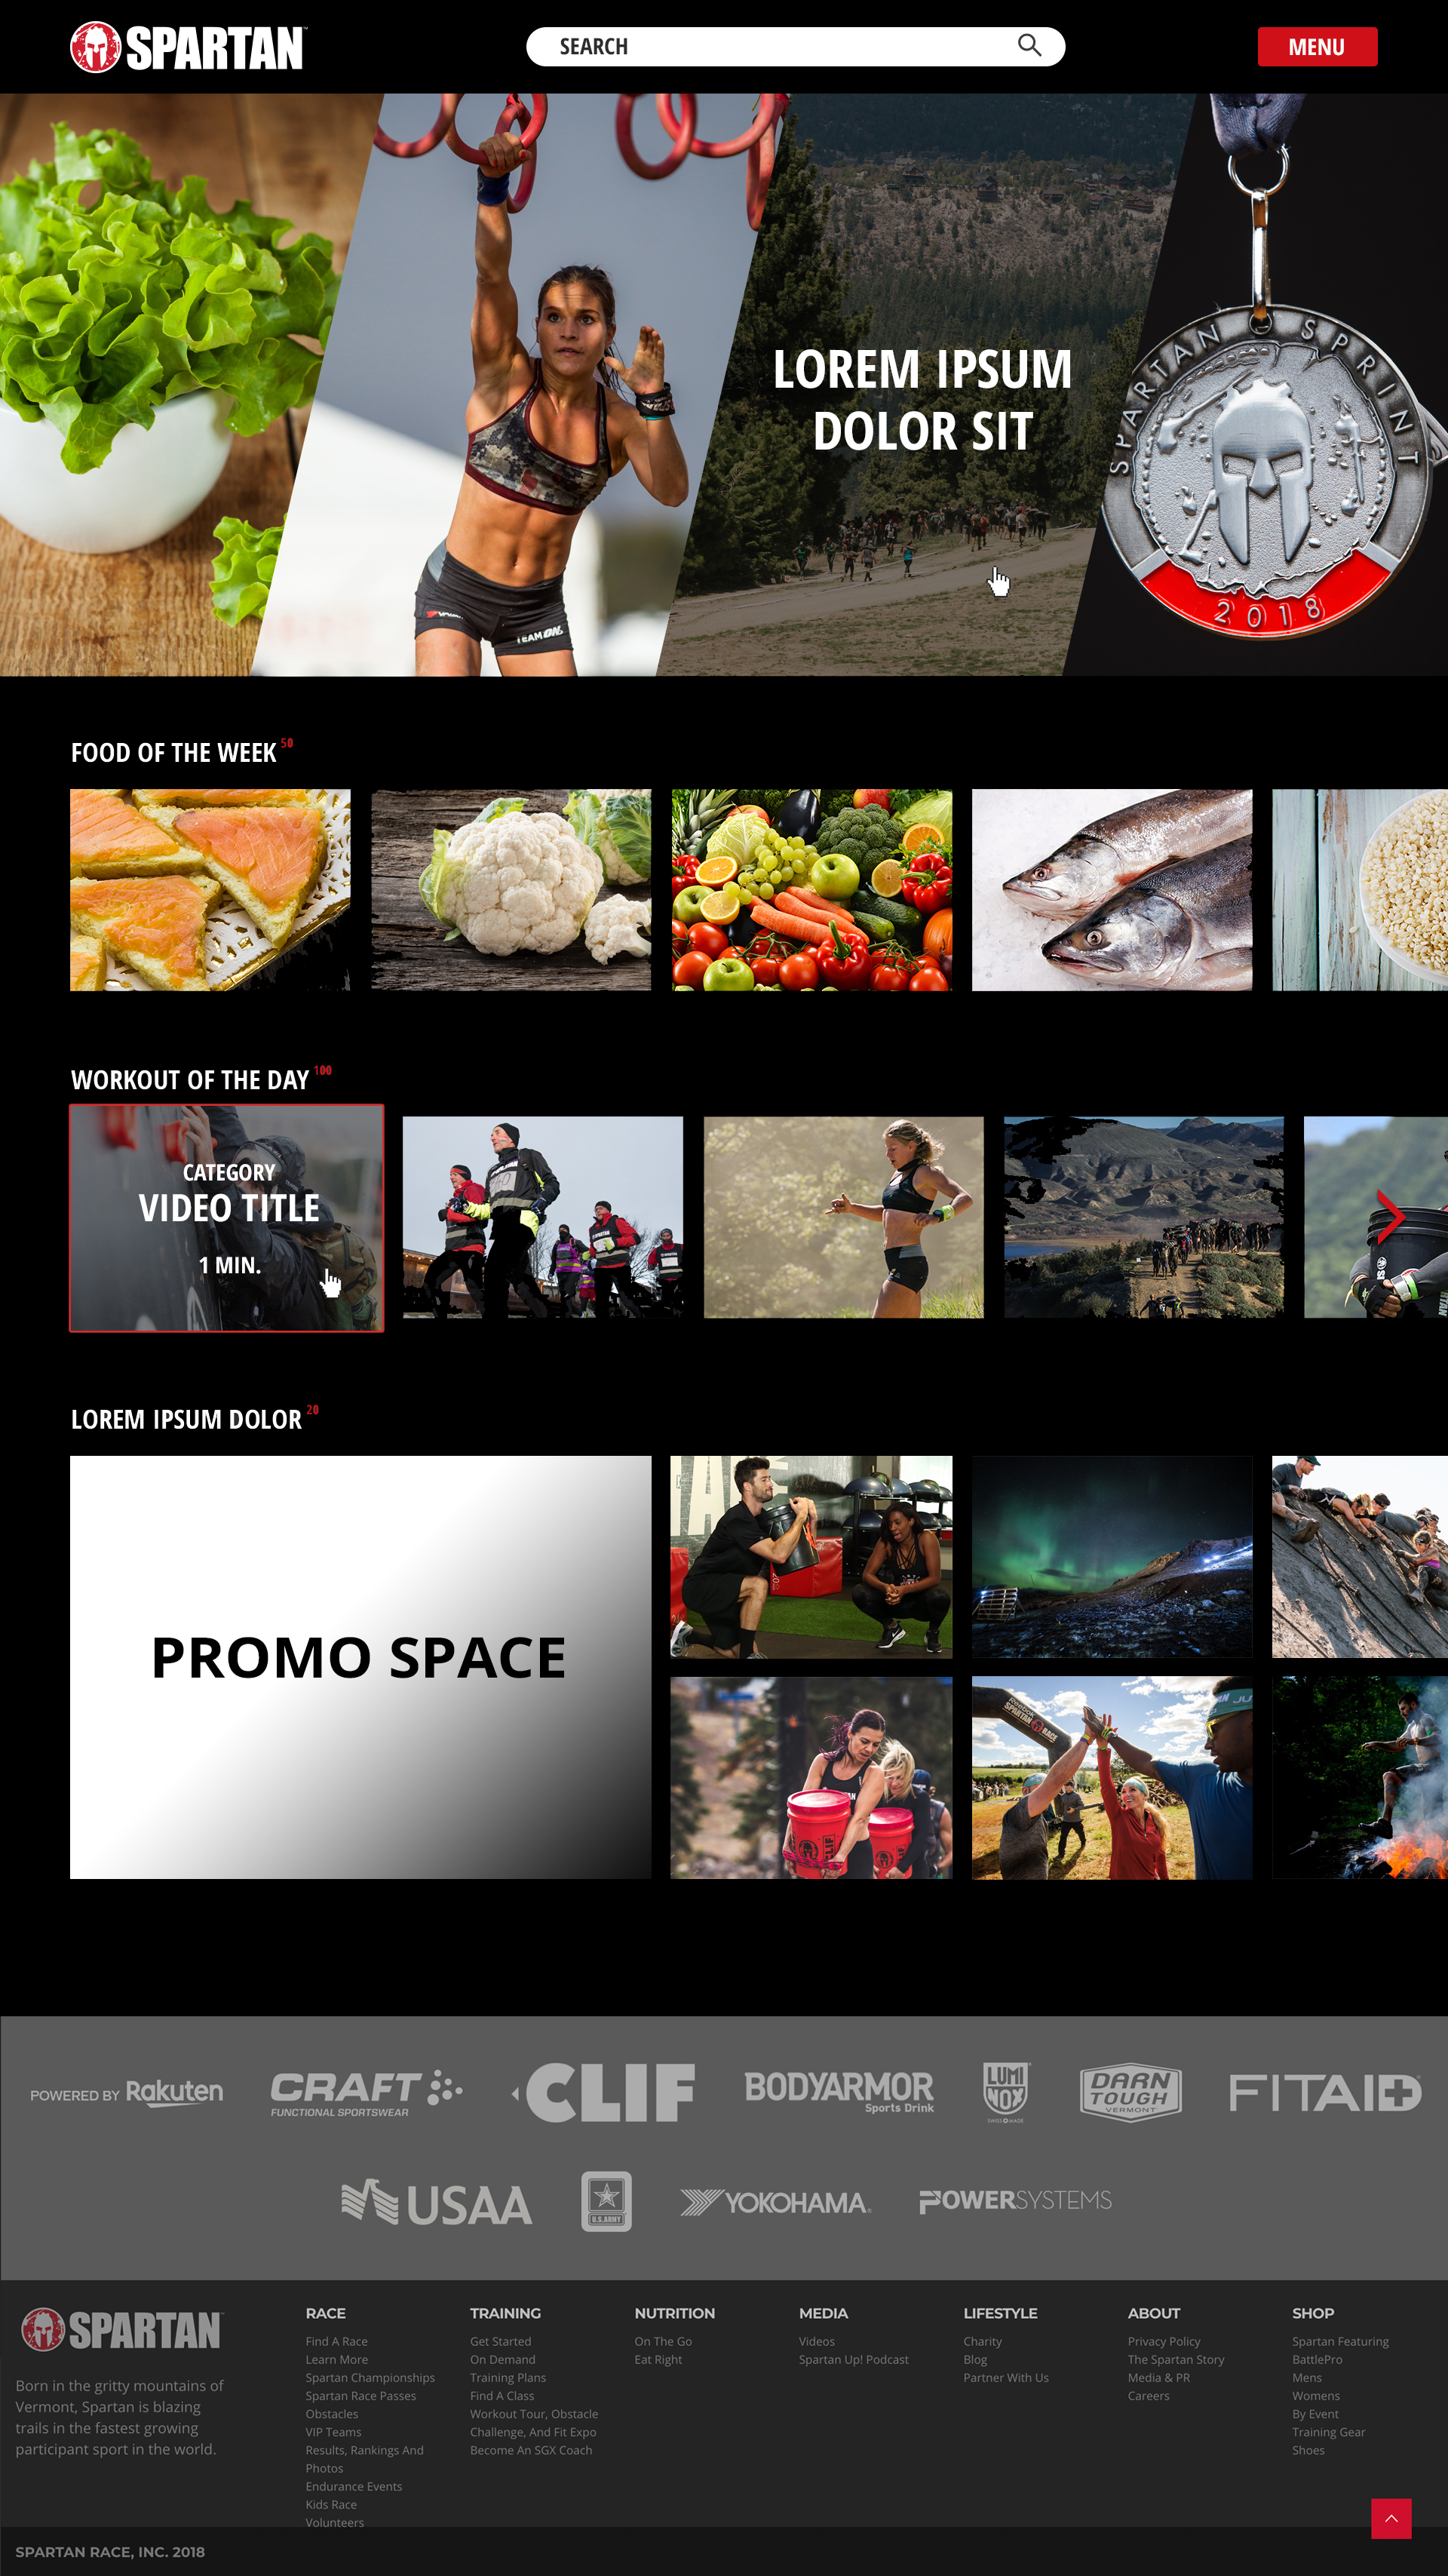 Web Design: Spartan Video